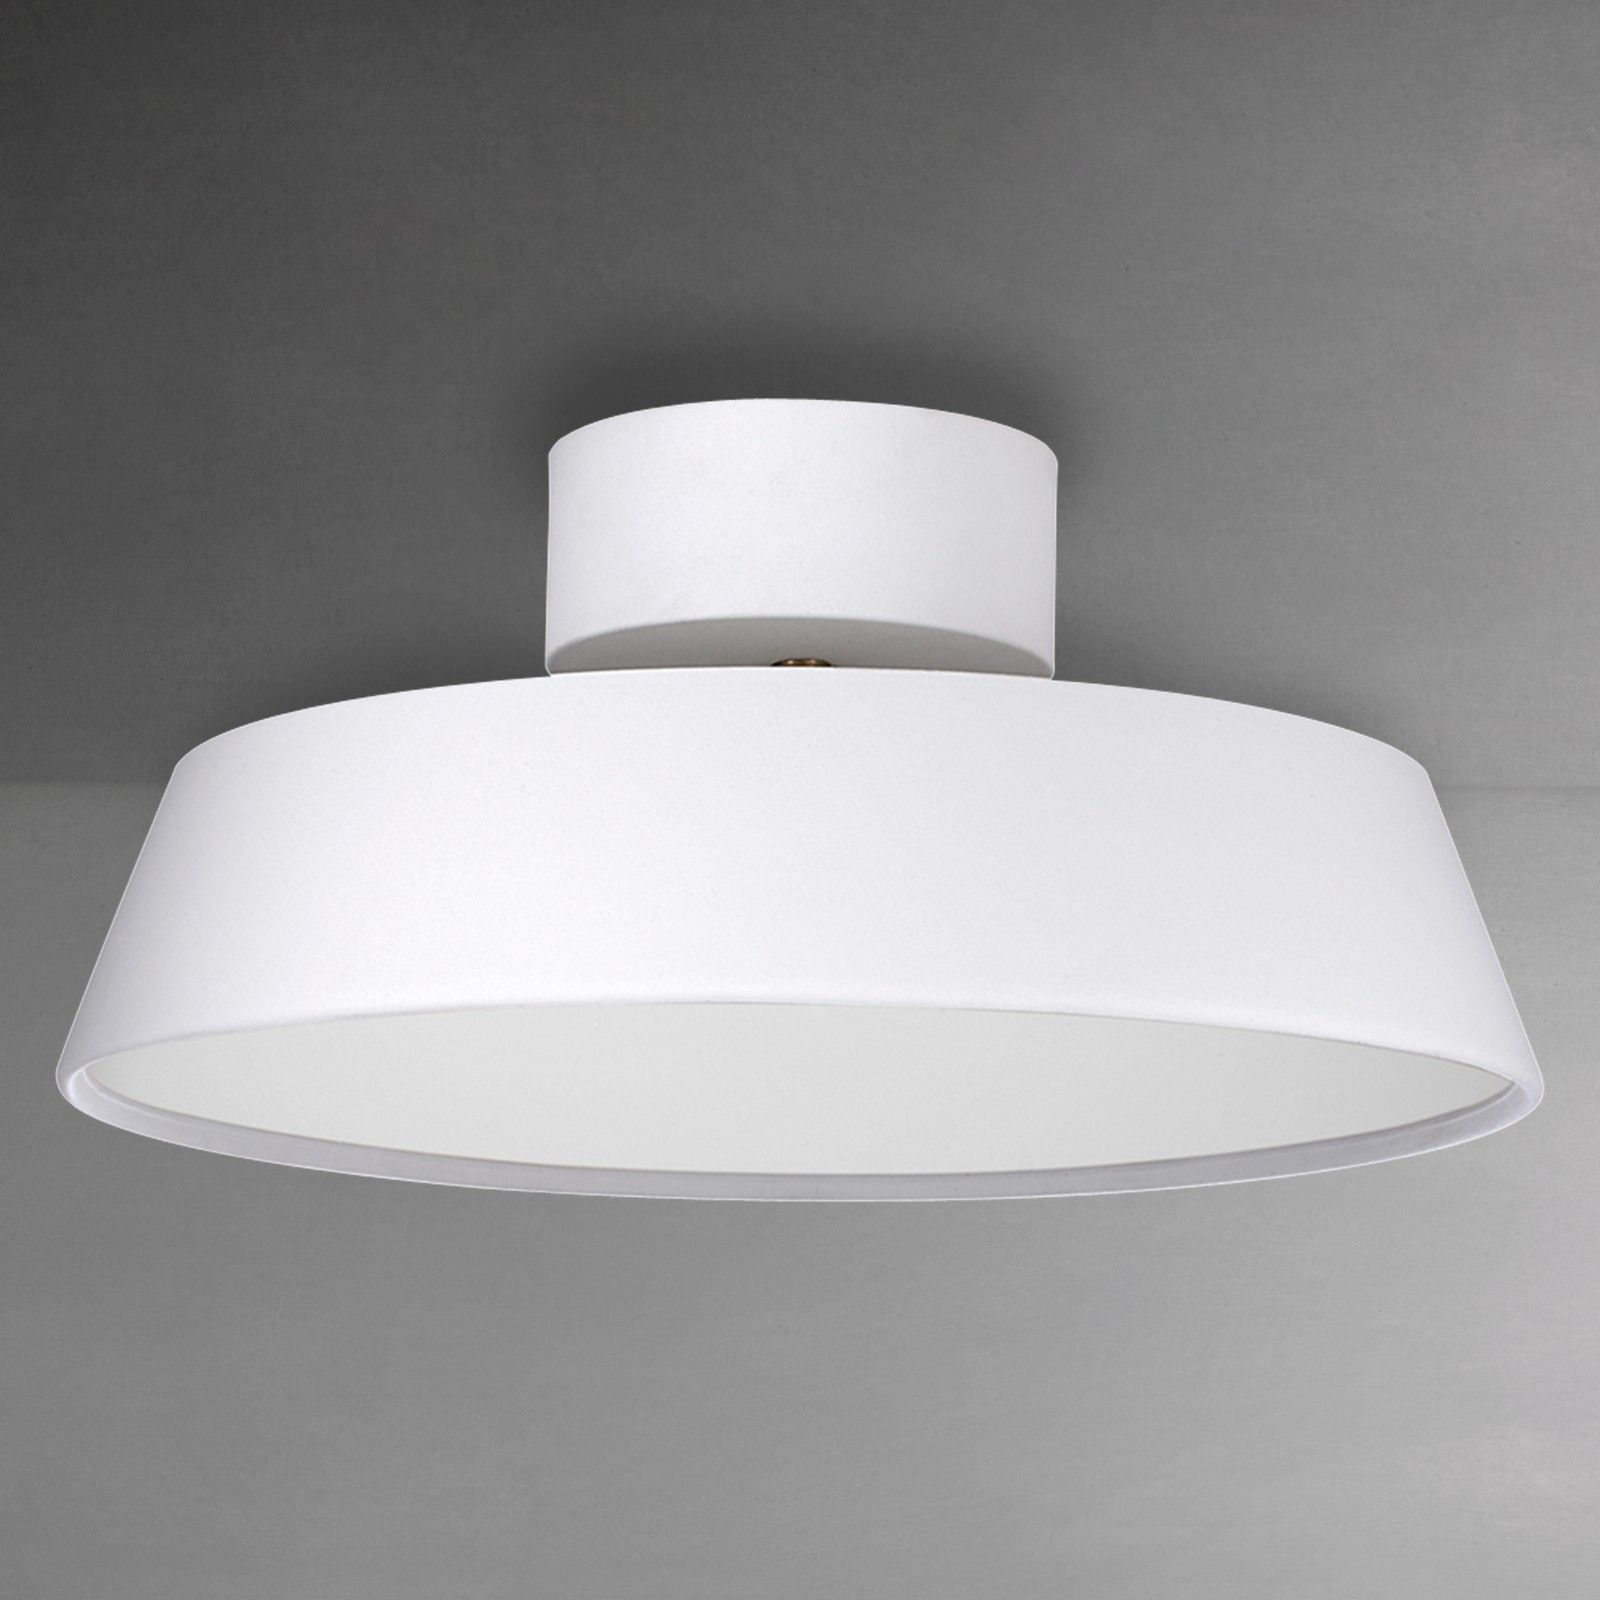 Buy nordlux alba led adjustable tilt semi flush ceiling light online buy nordlux alba led adjustable tilt semi flush ceiling light online at johnlewis aloadofball Choice Image